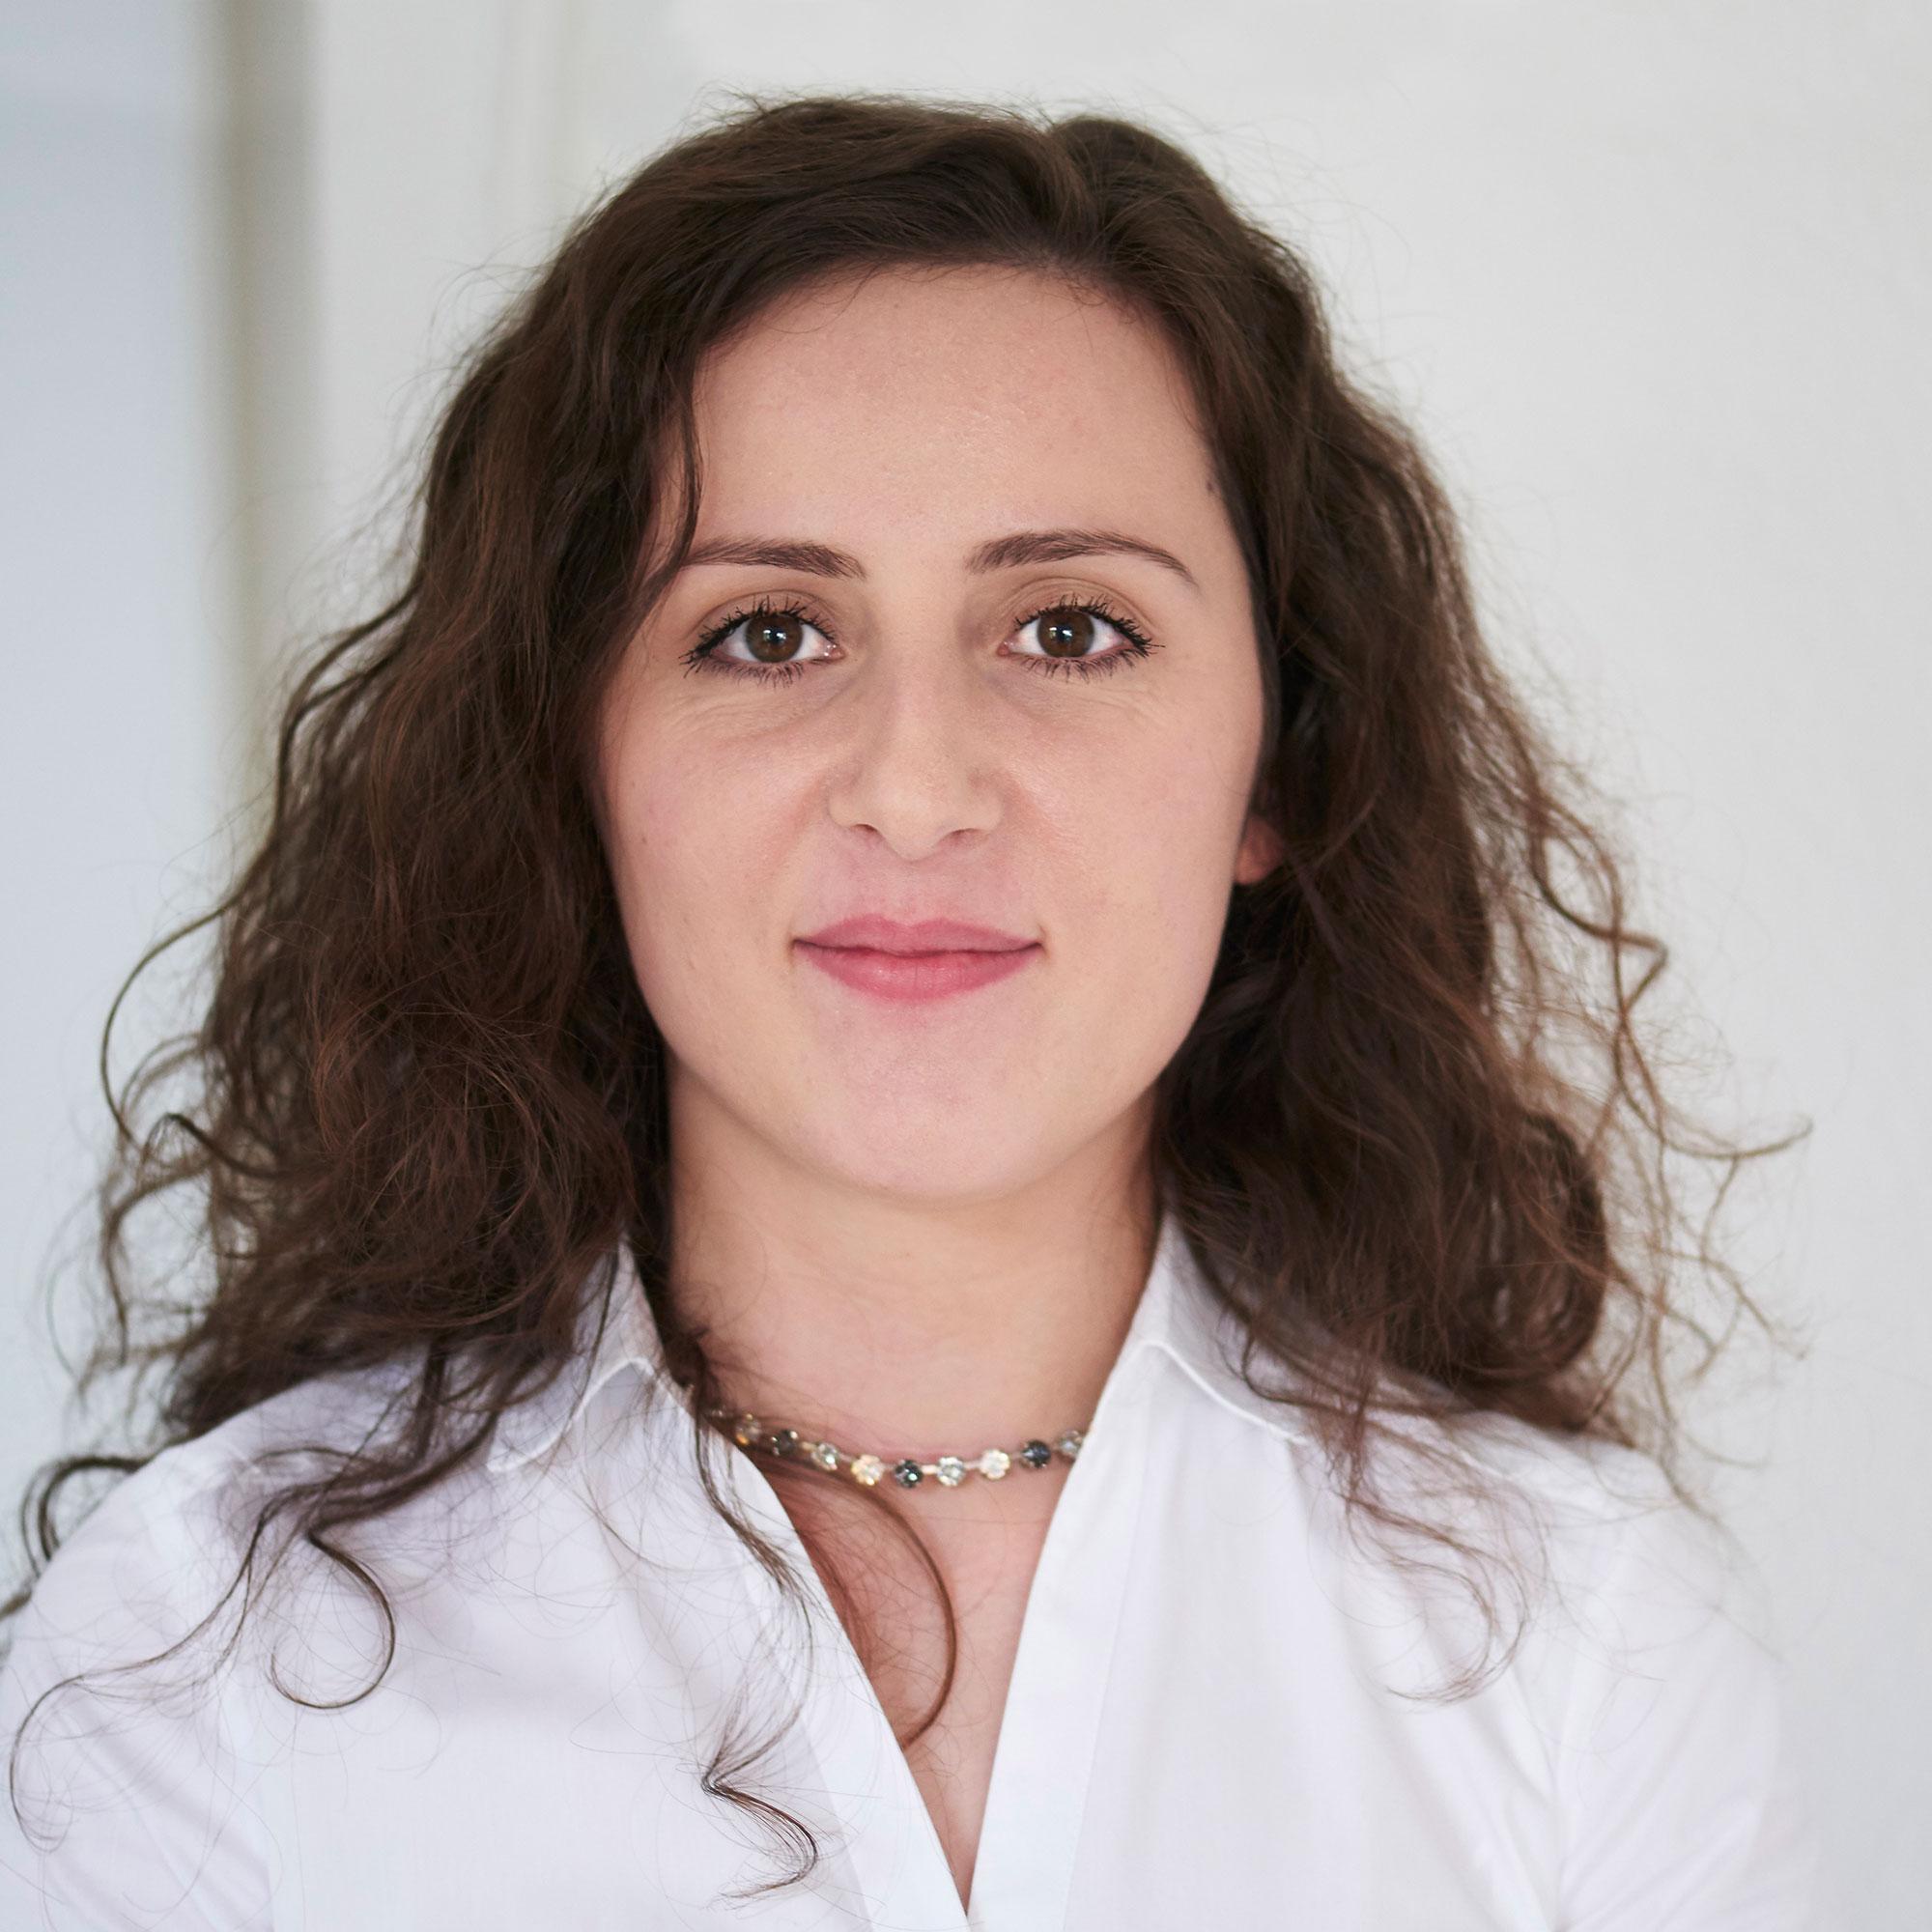 Liridona Islami